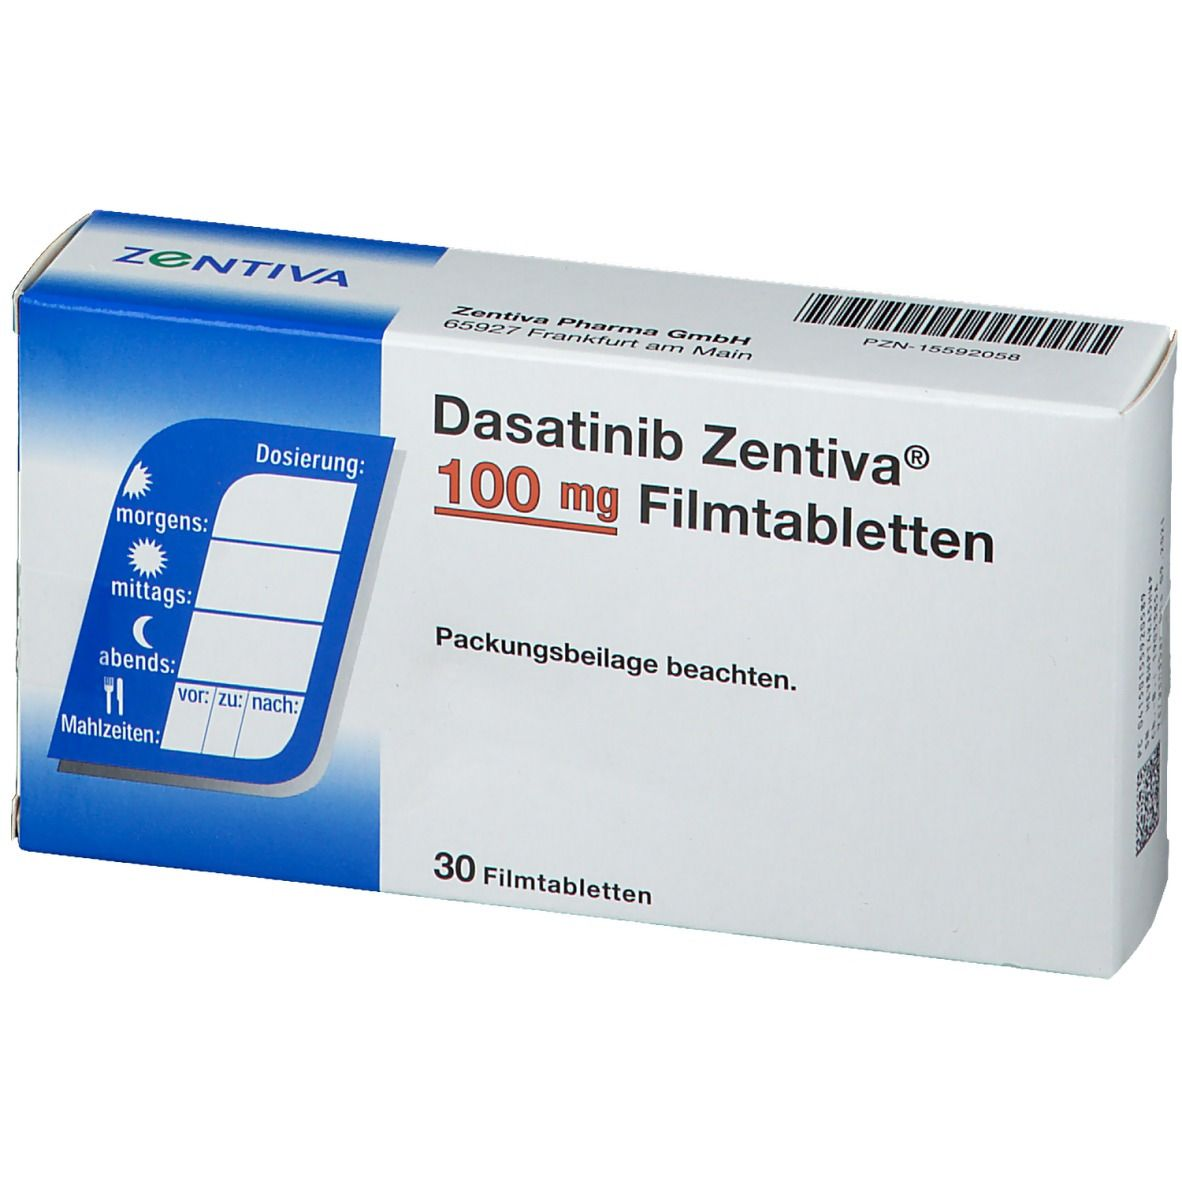 DASATINIB Zentiva 100 mg Filmtabletten